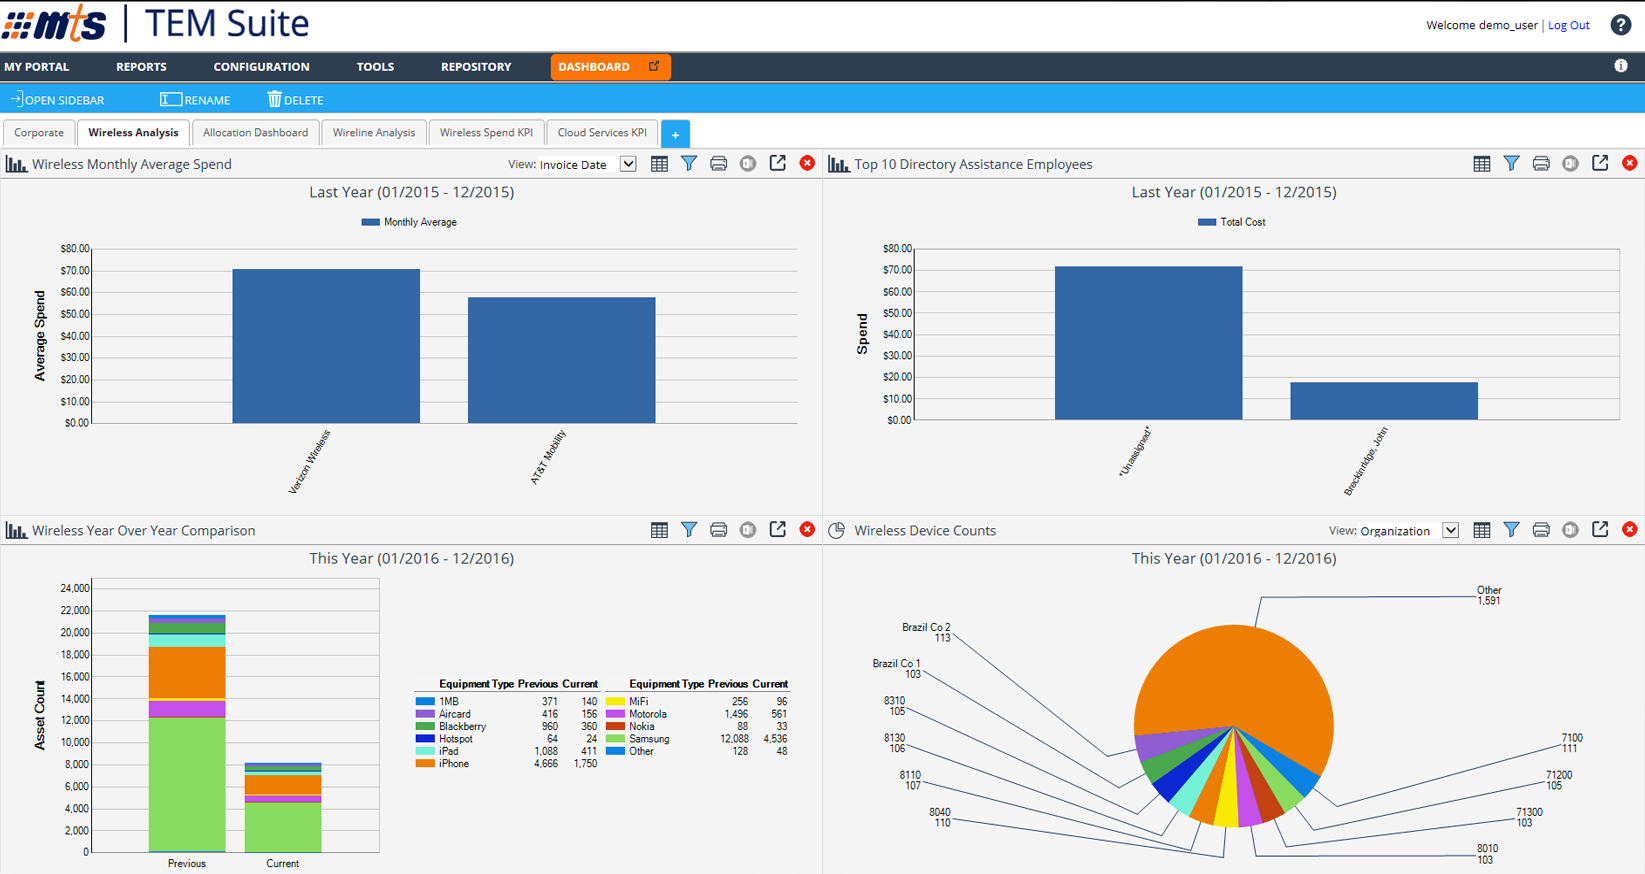 eXsight Software - Wireless analysis dashboard